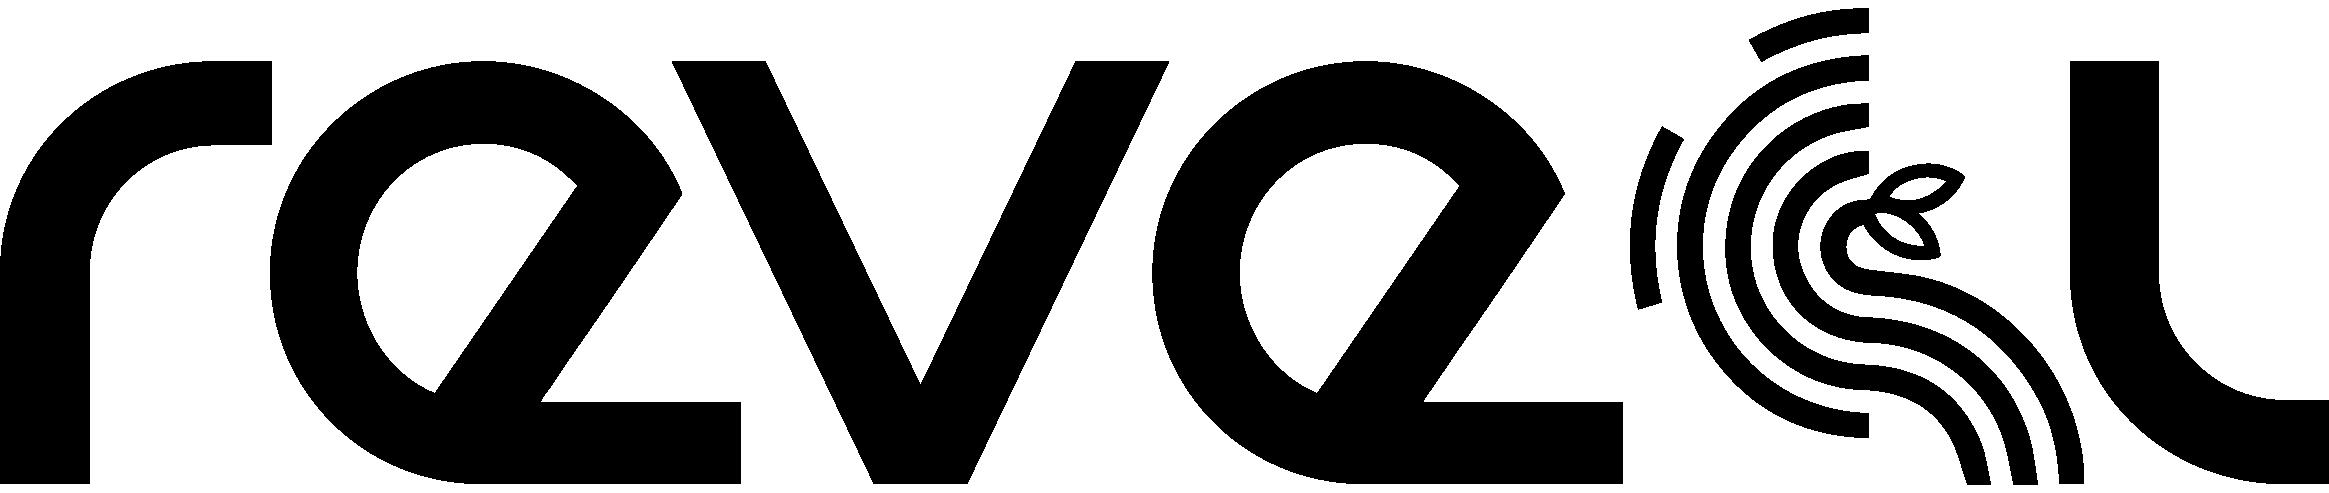 reveal logo-final-02